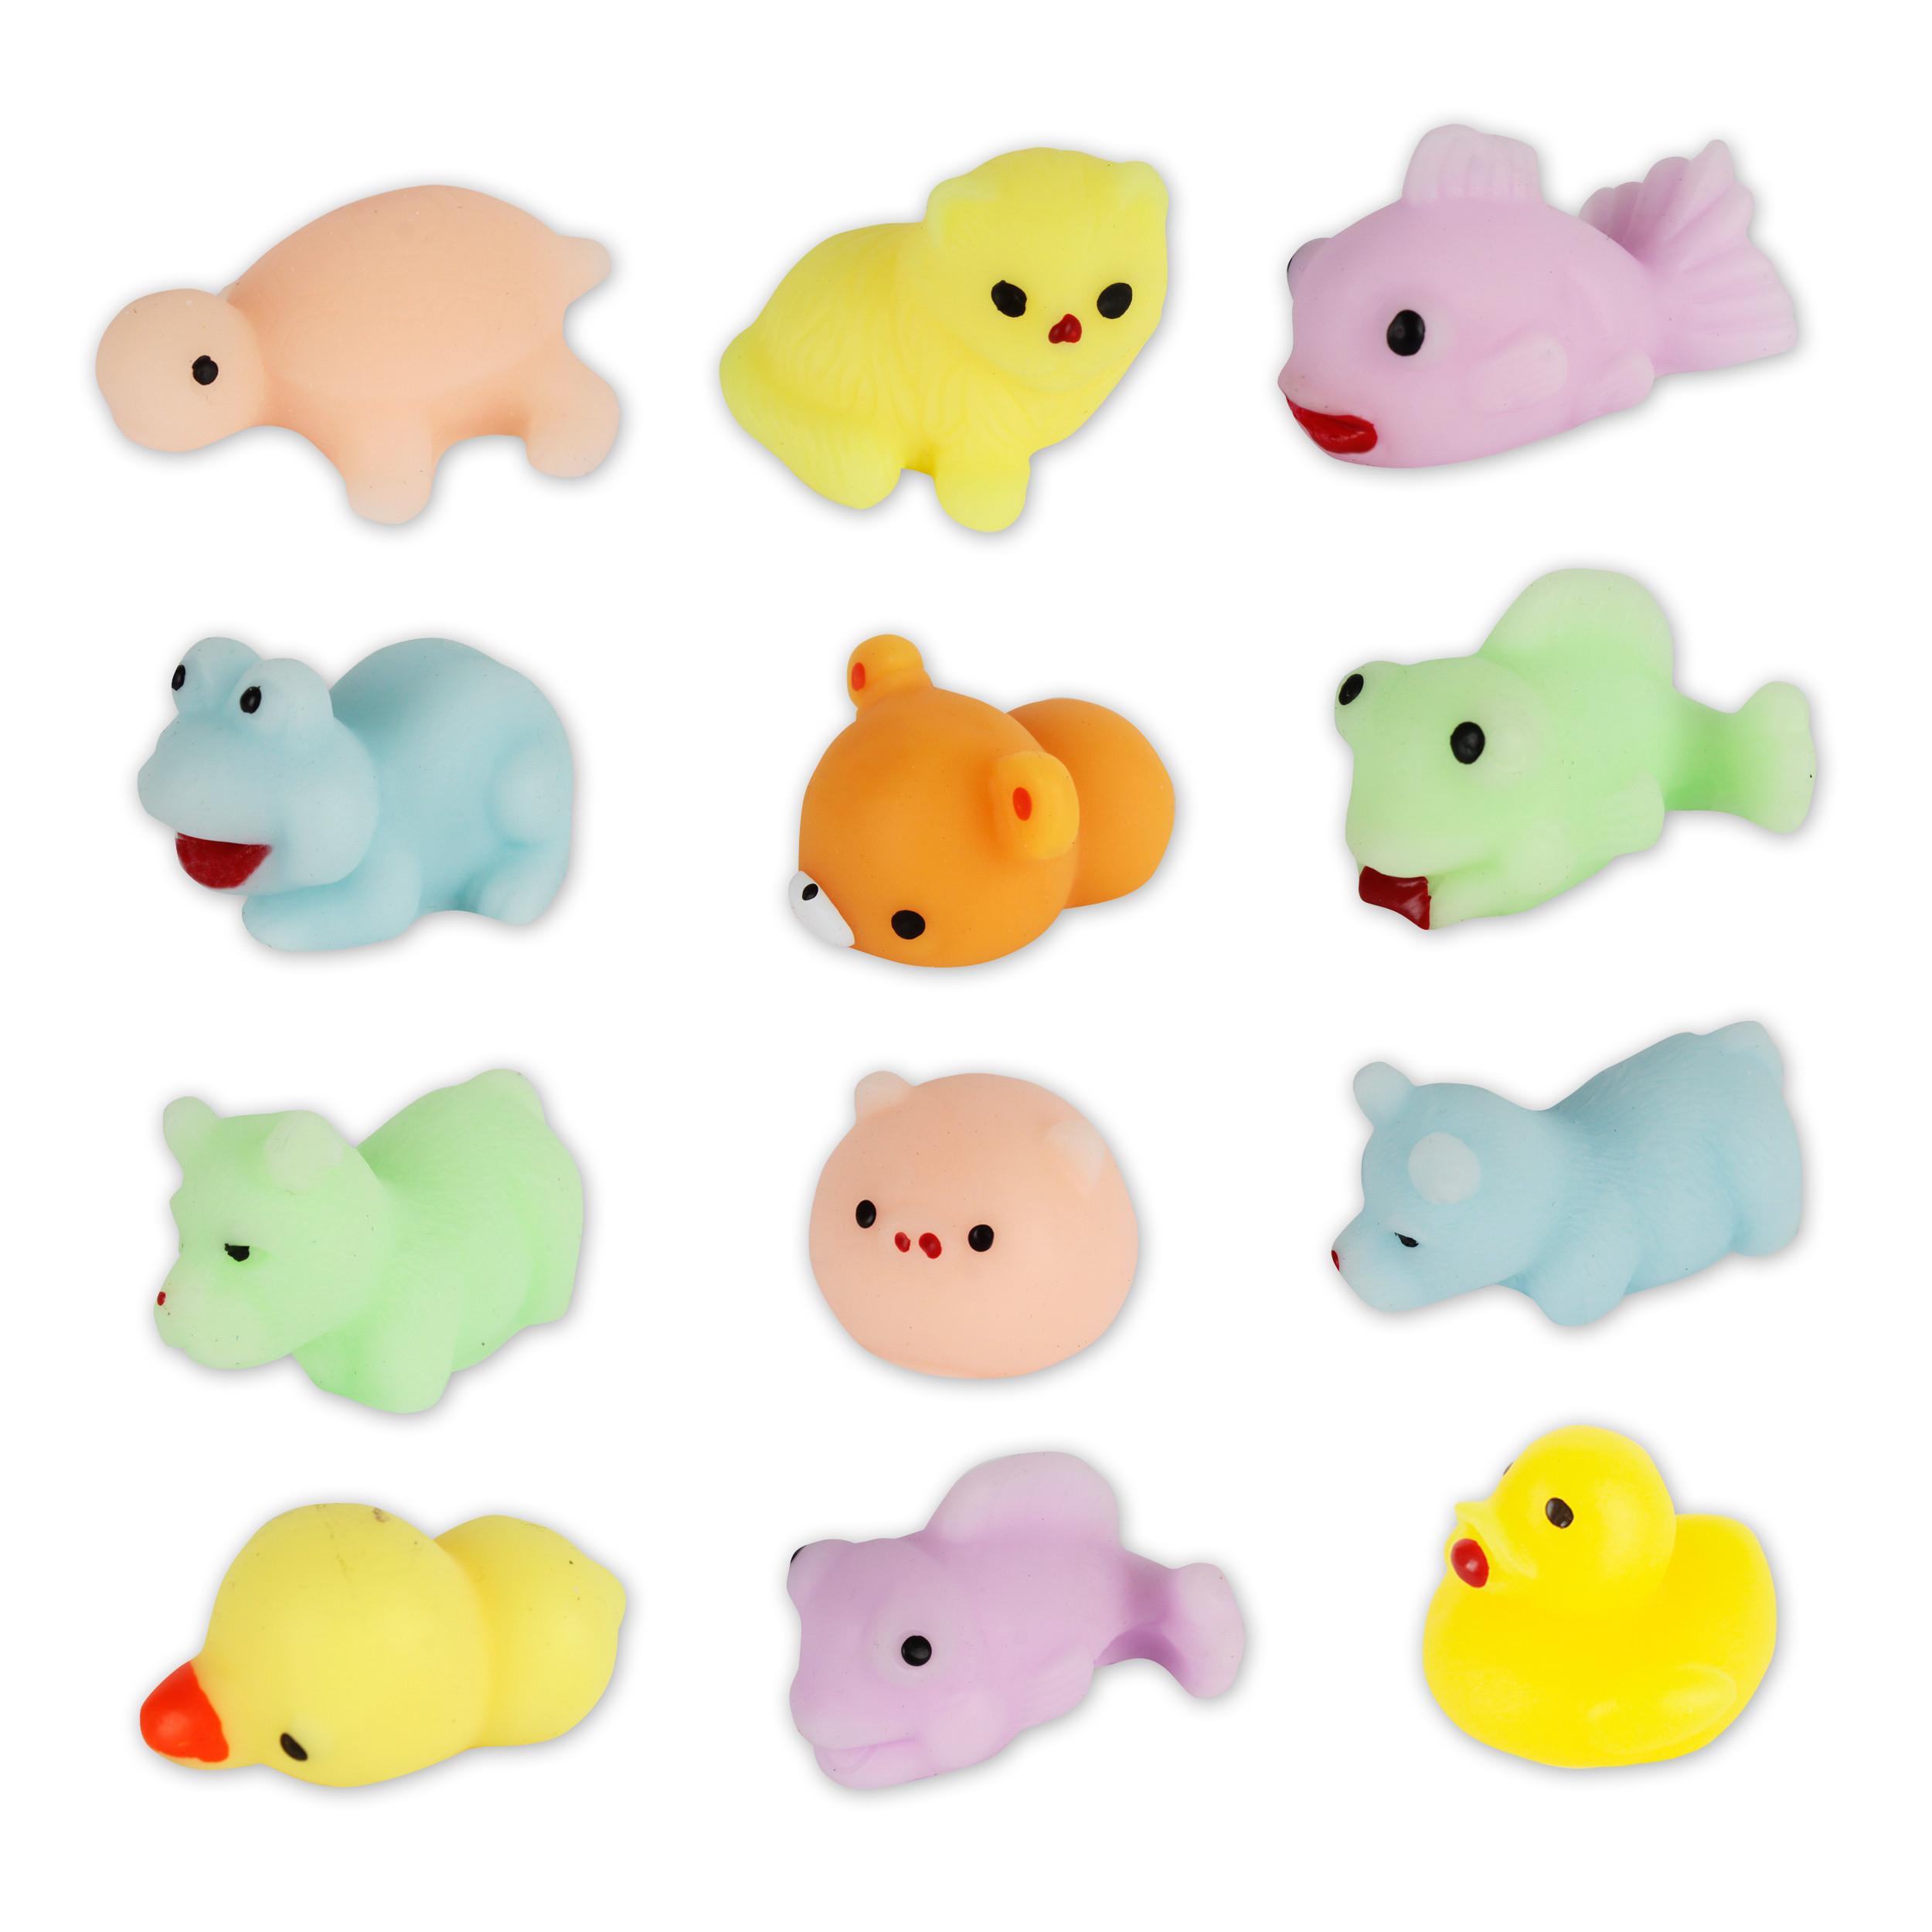 Игрушки-антистресс 1toy Анимяшки игрушки для детей